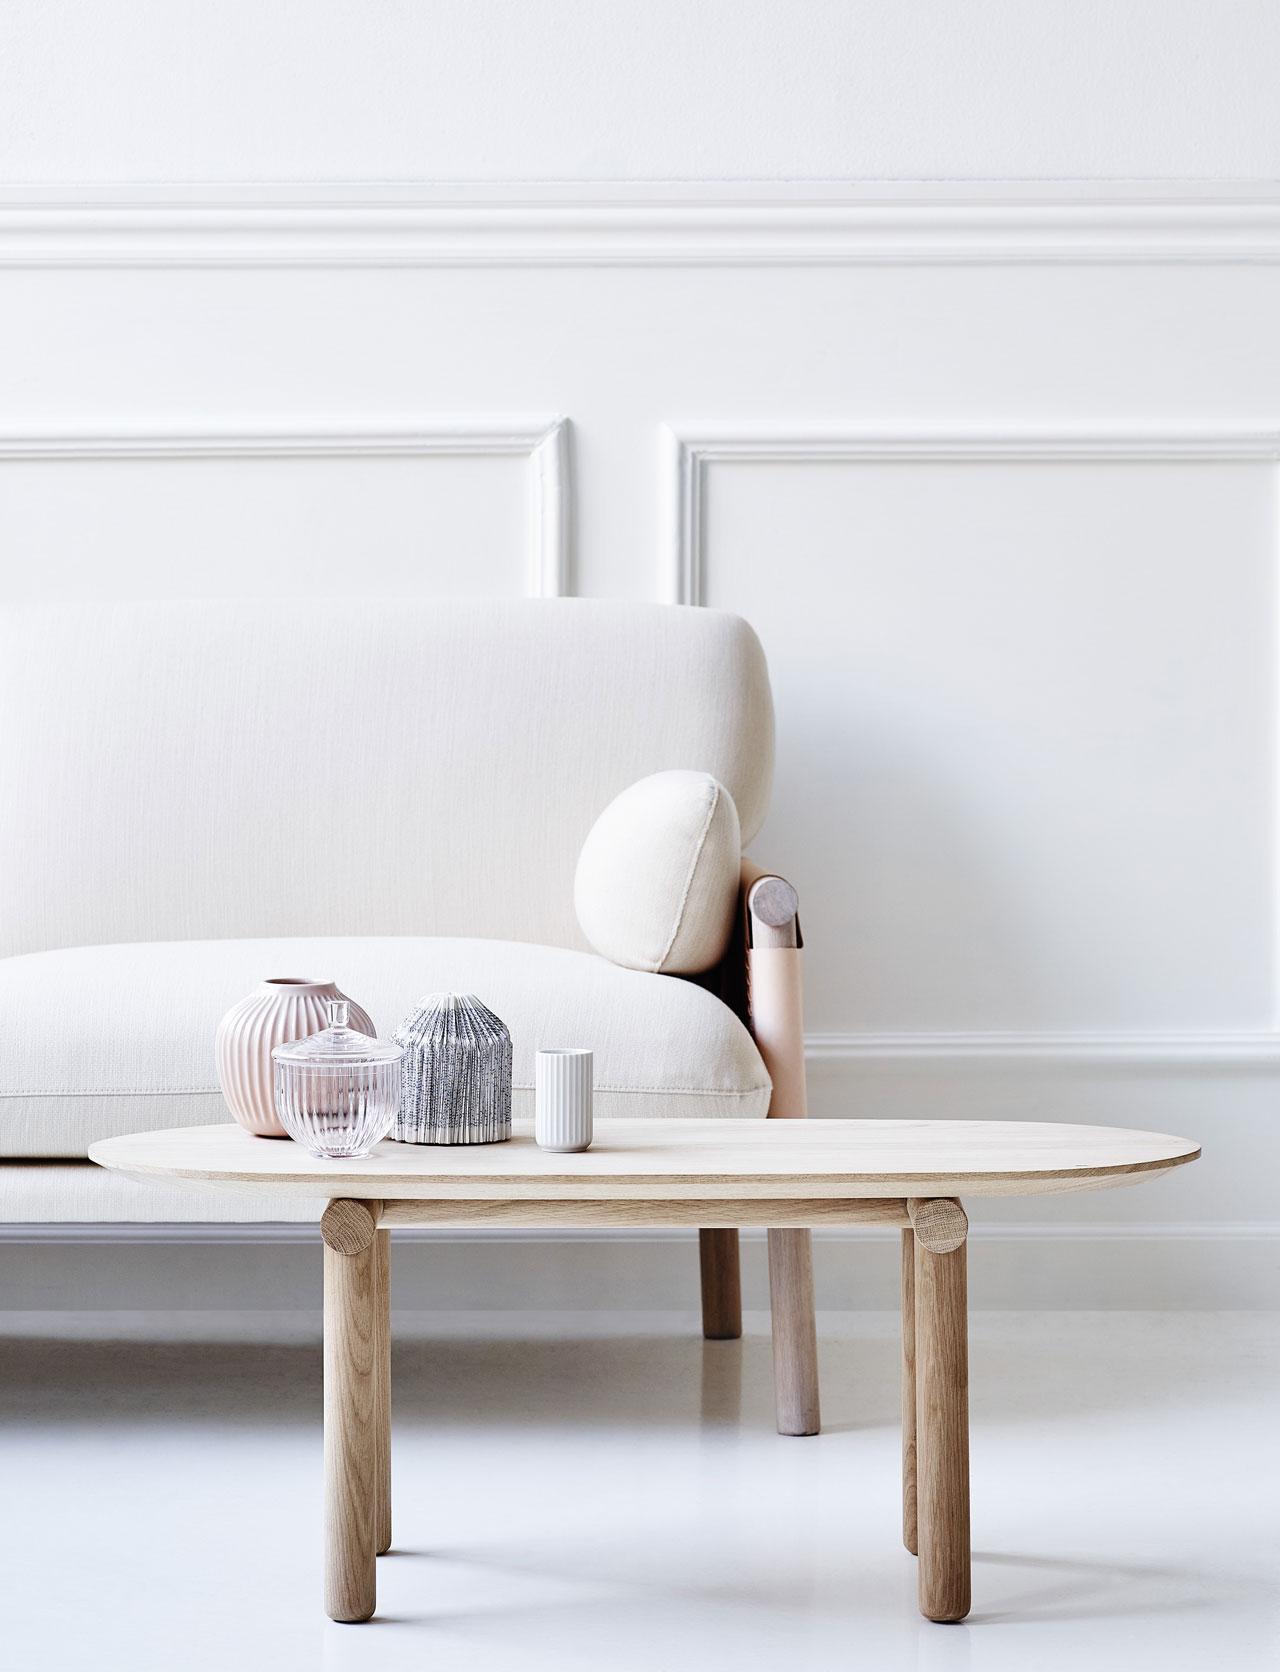 The latest addition in the Savannah furniture series by Monica Förster for Erik Jørgensen. Savannah table, photo©Erik Jørgensen.